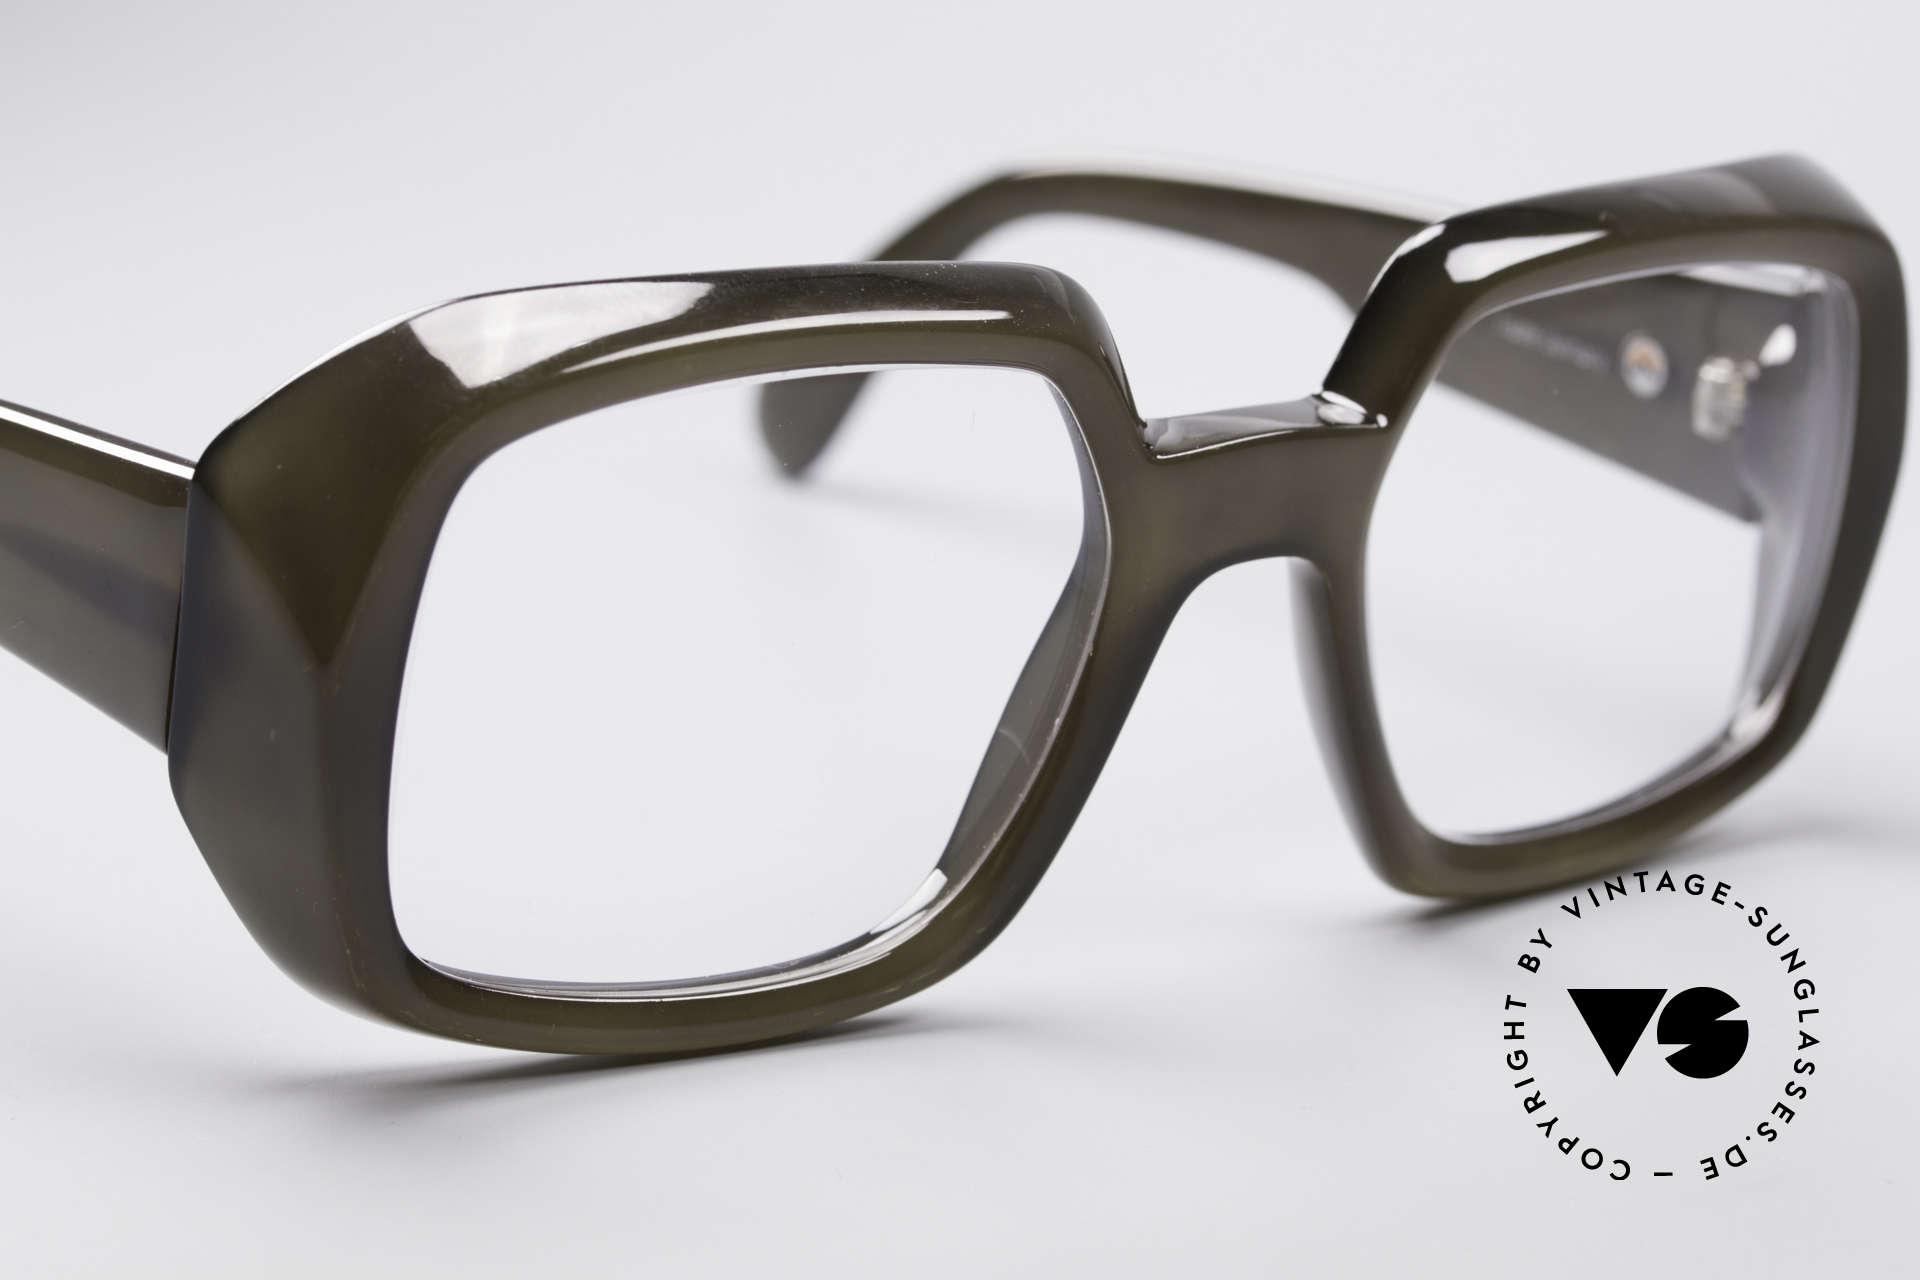 ViennaLine Royal 1601 Goliath Monster Specs, nevertheless, rather a MEDIUM size (130mm frame width), Made for Men